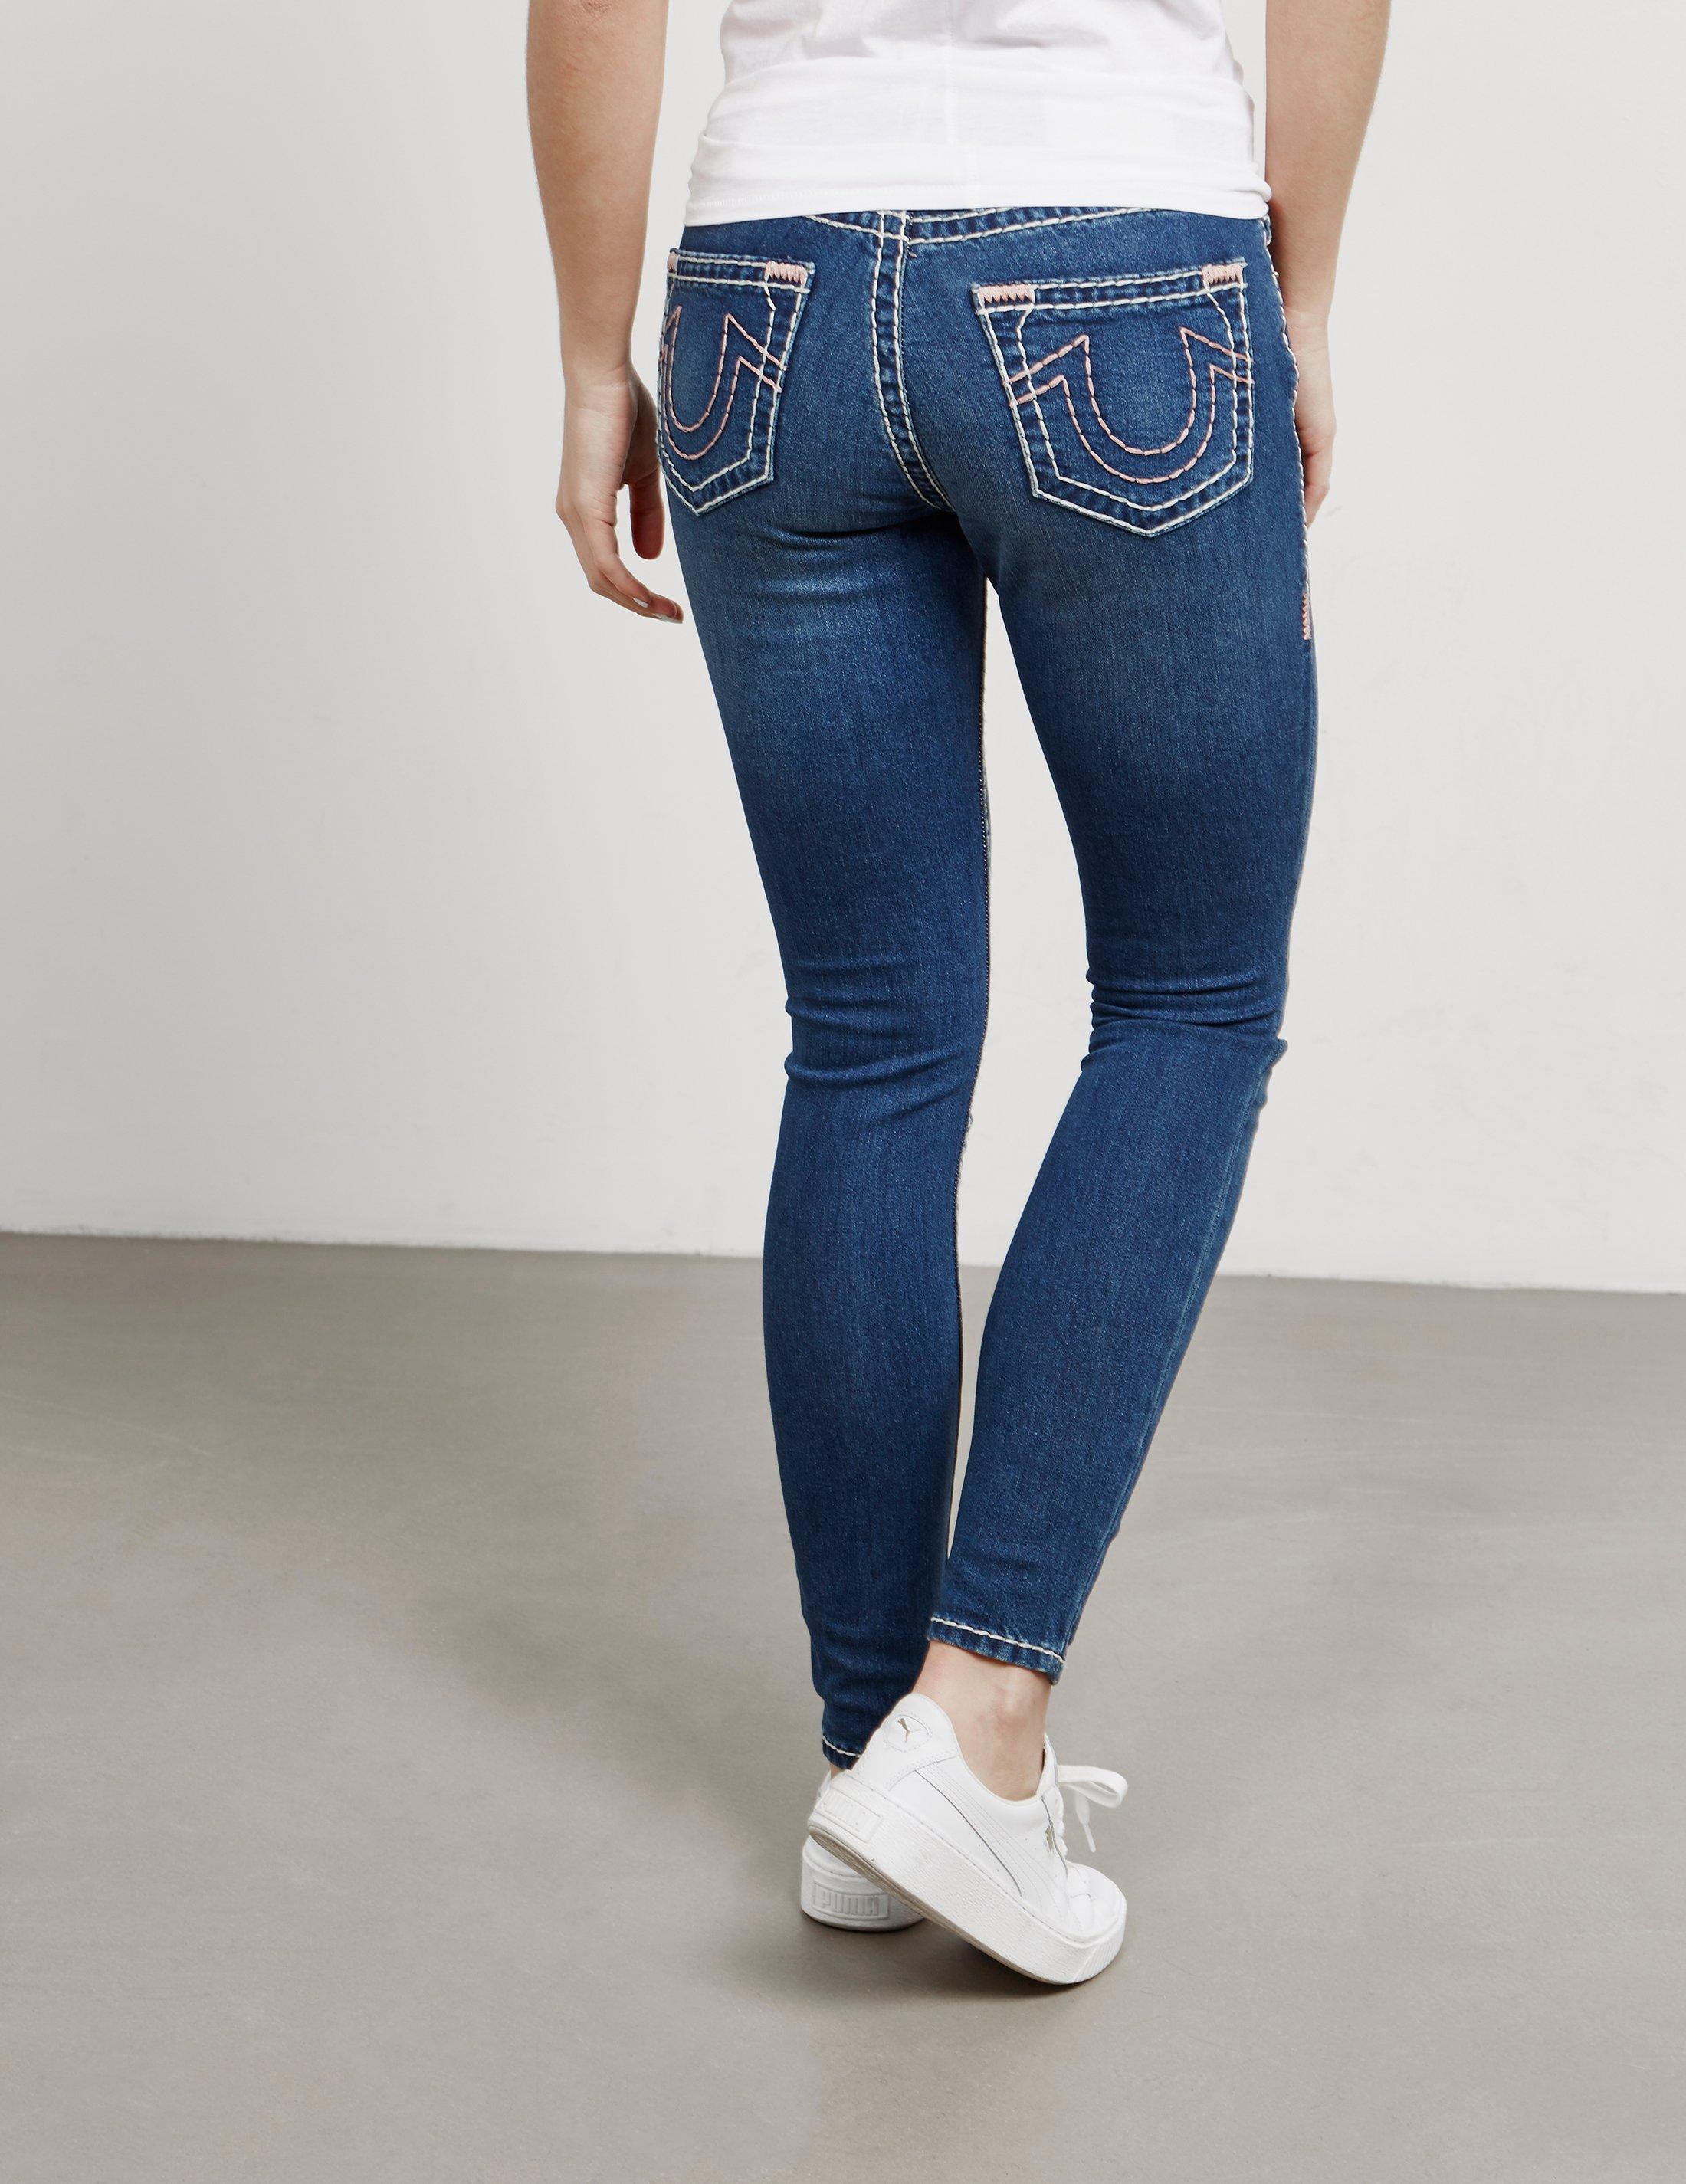 278907146870e True Religion Jennie Super Skinny Jeans Azure Blue/azure Blue in Blue - Lyst